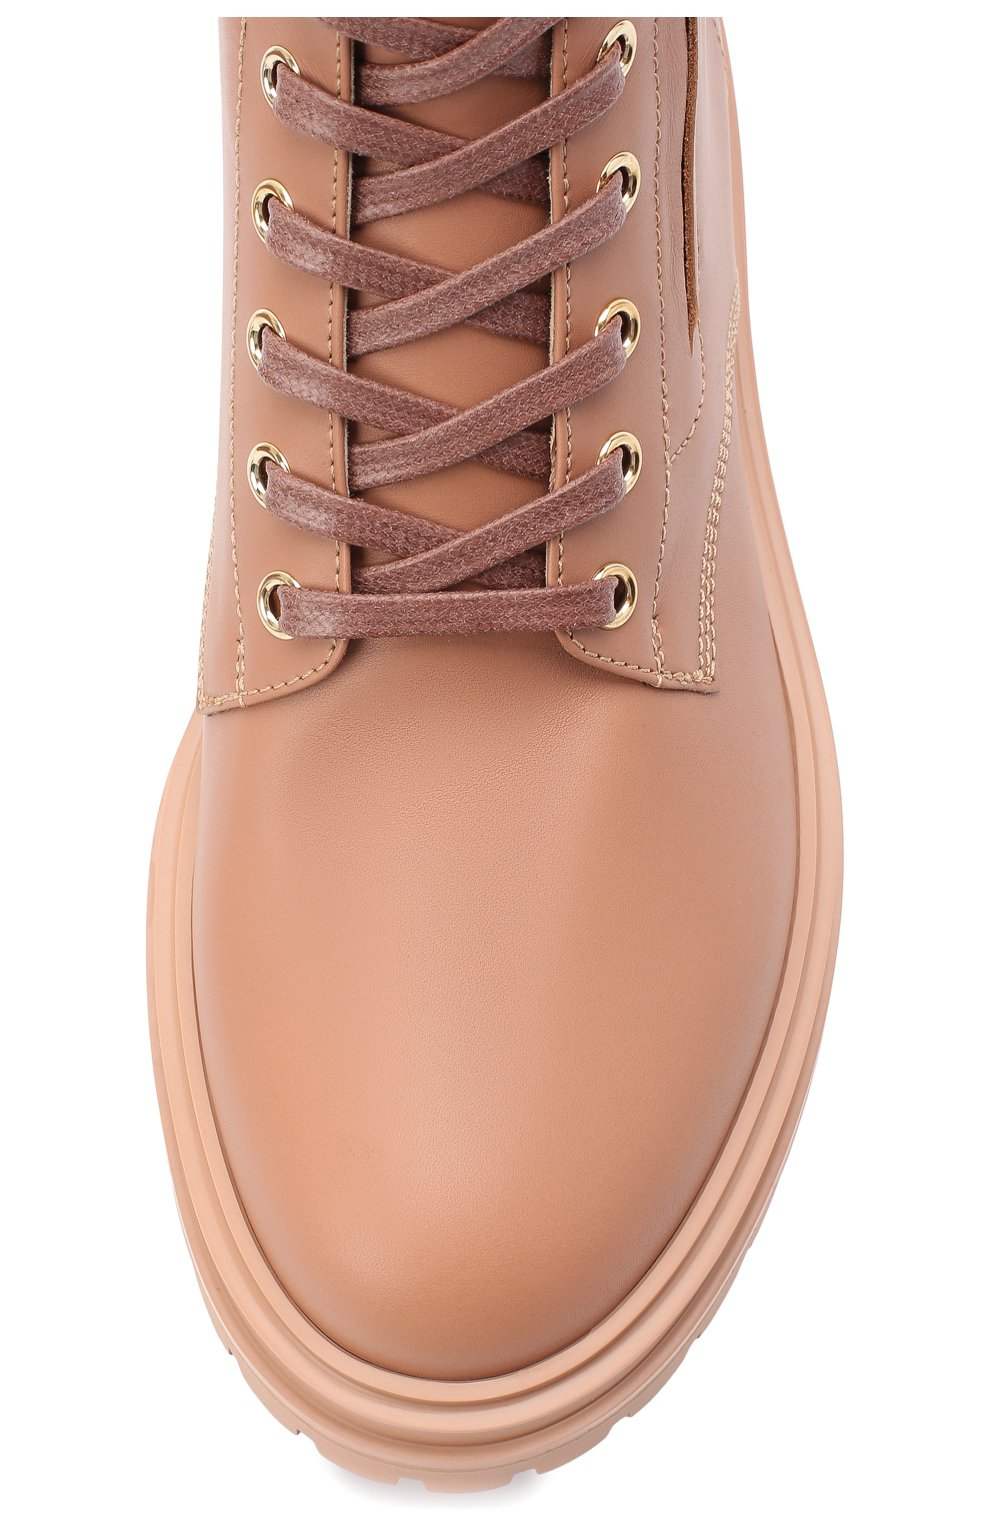 Женские кожаные ботинки turon GIANVITO ROSSI бежевого цвета, арт. G73432.20G0M.CLNPRAL | Фото 5